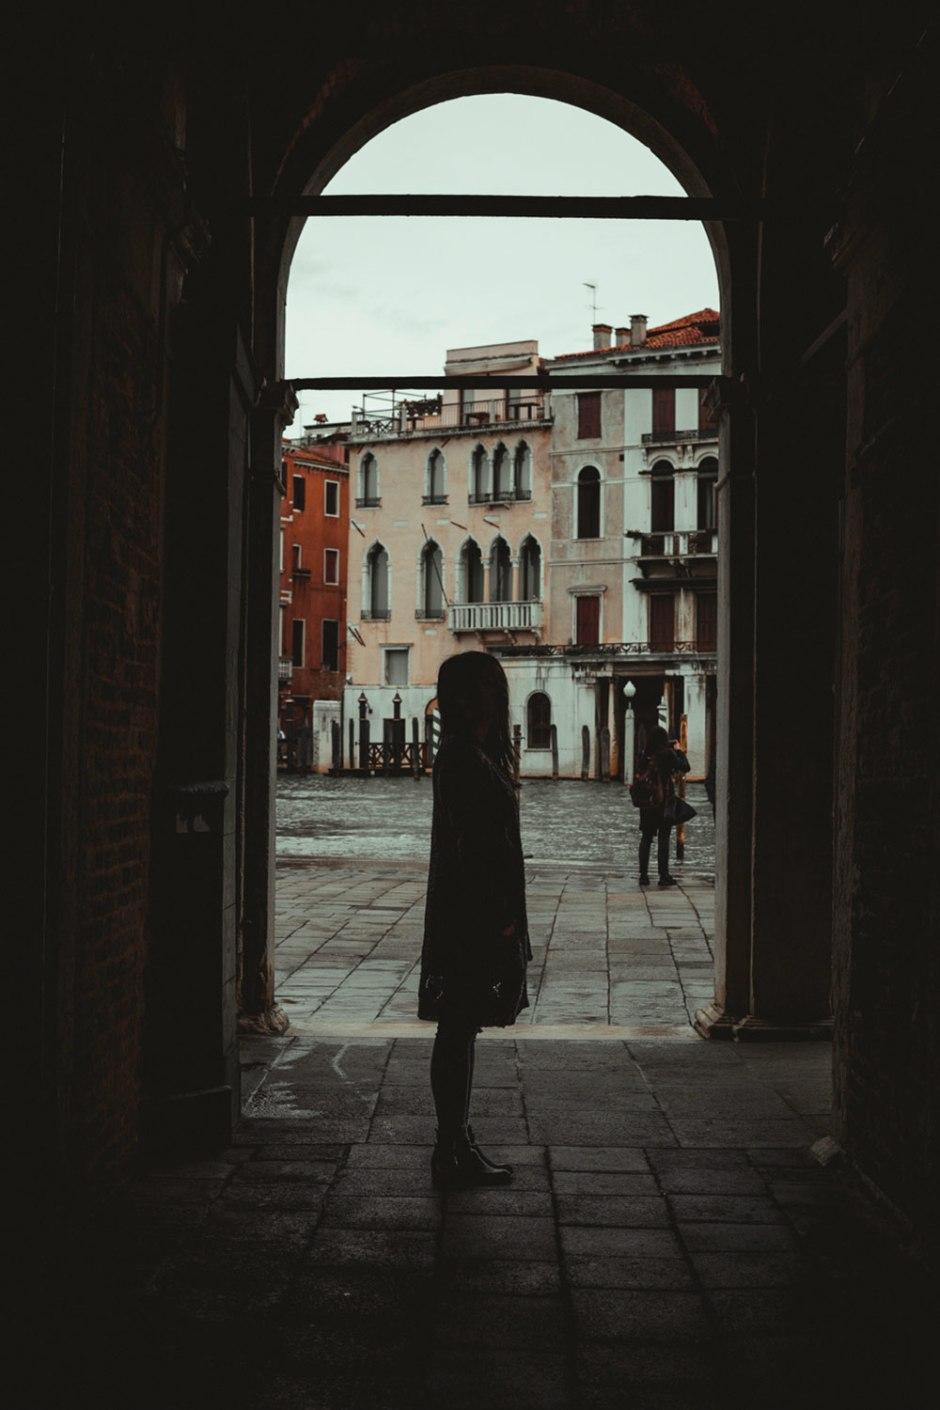 venedig shooting location (7)